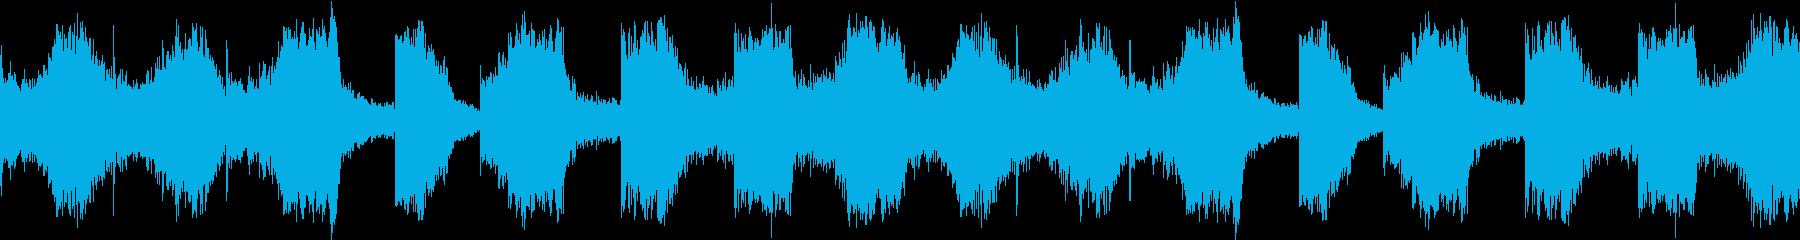 EDM リードシンセ 4 音楽制作用の再生済みの波形